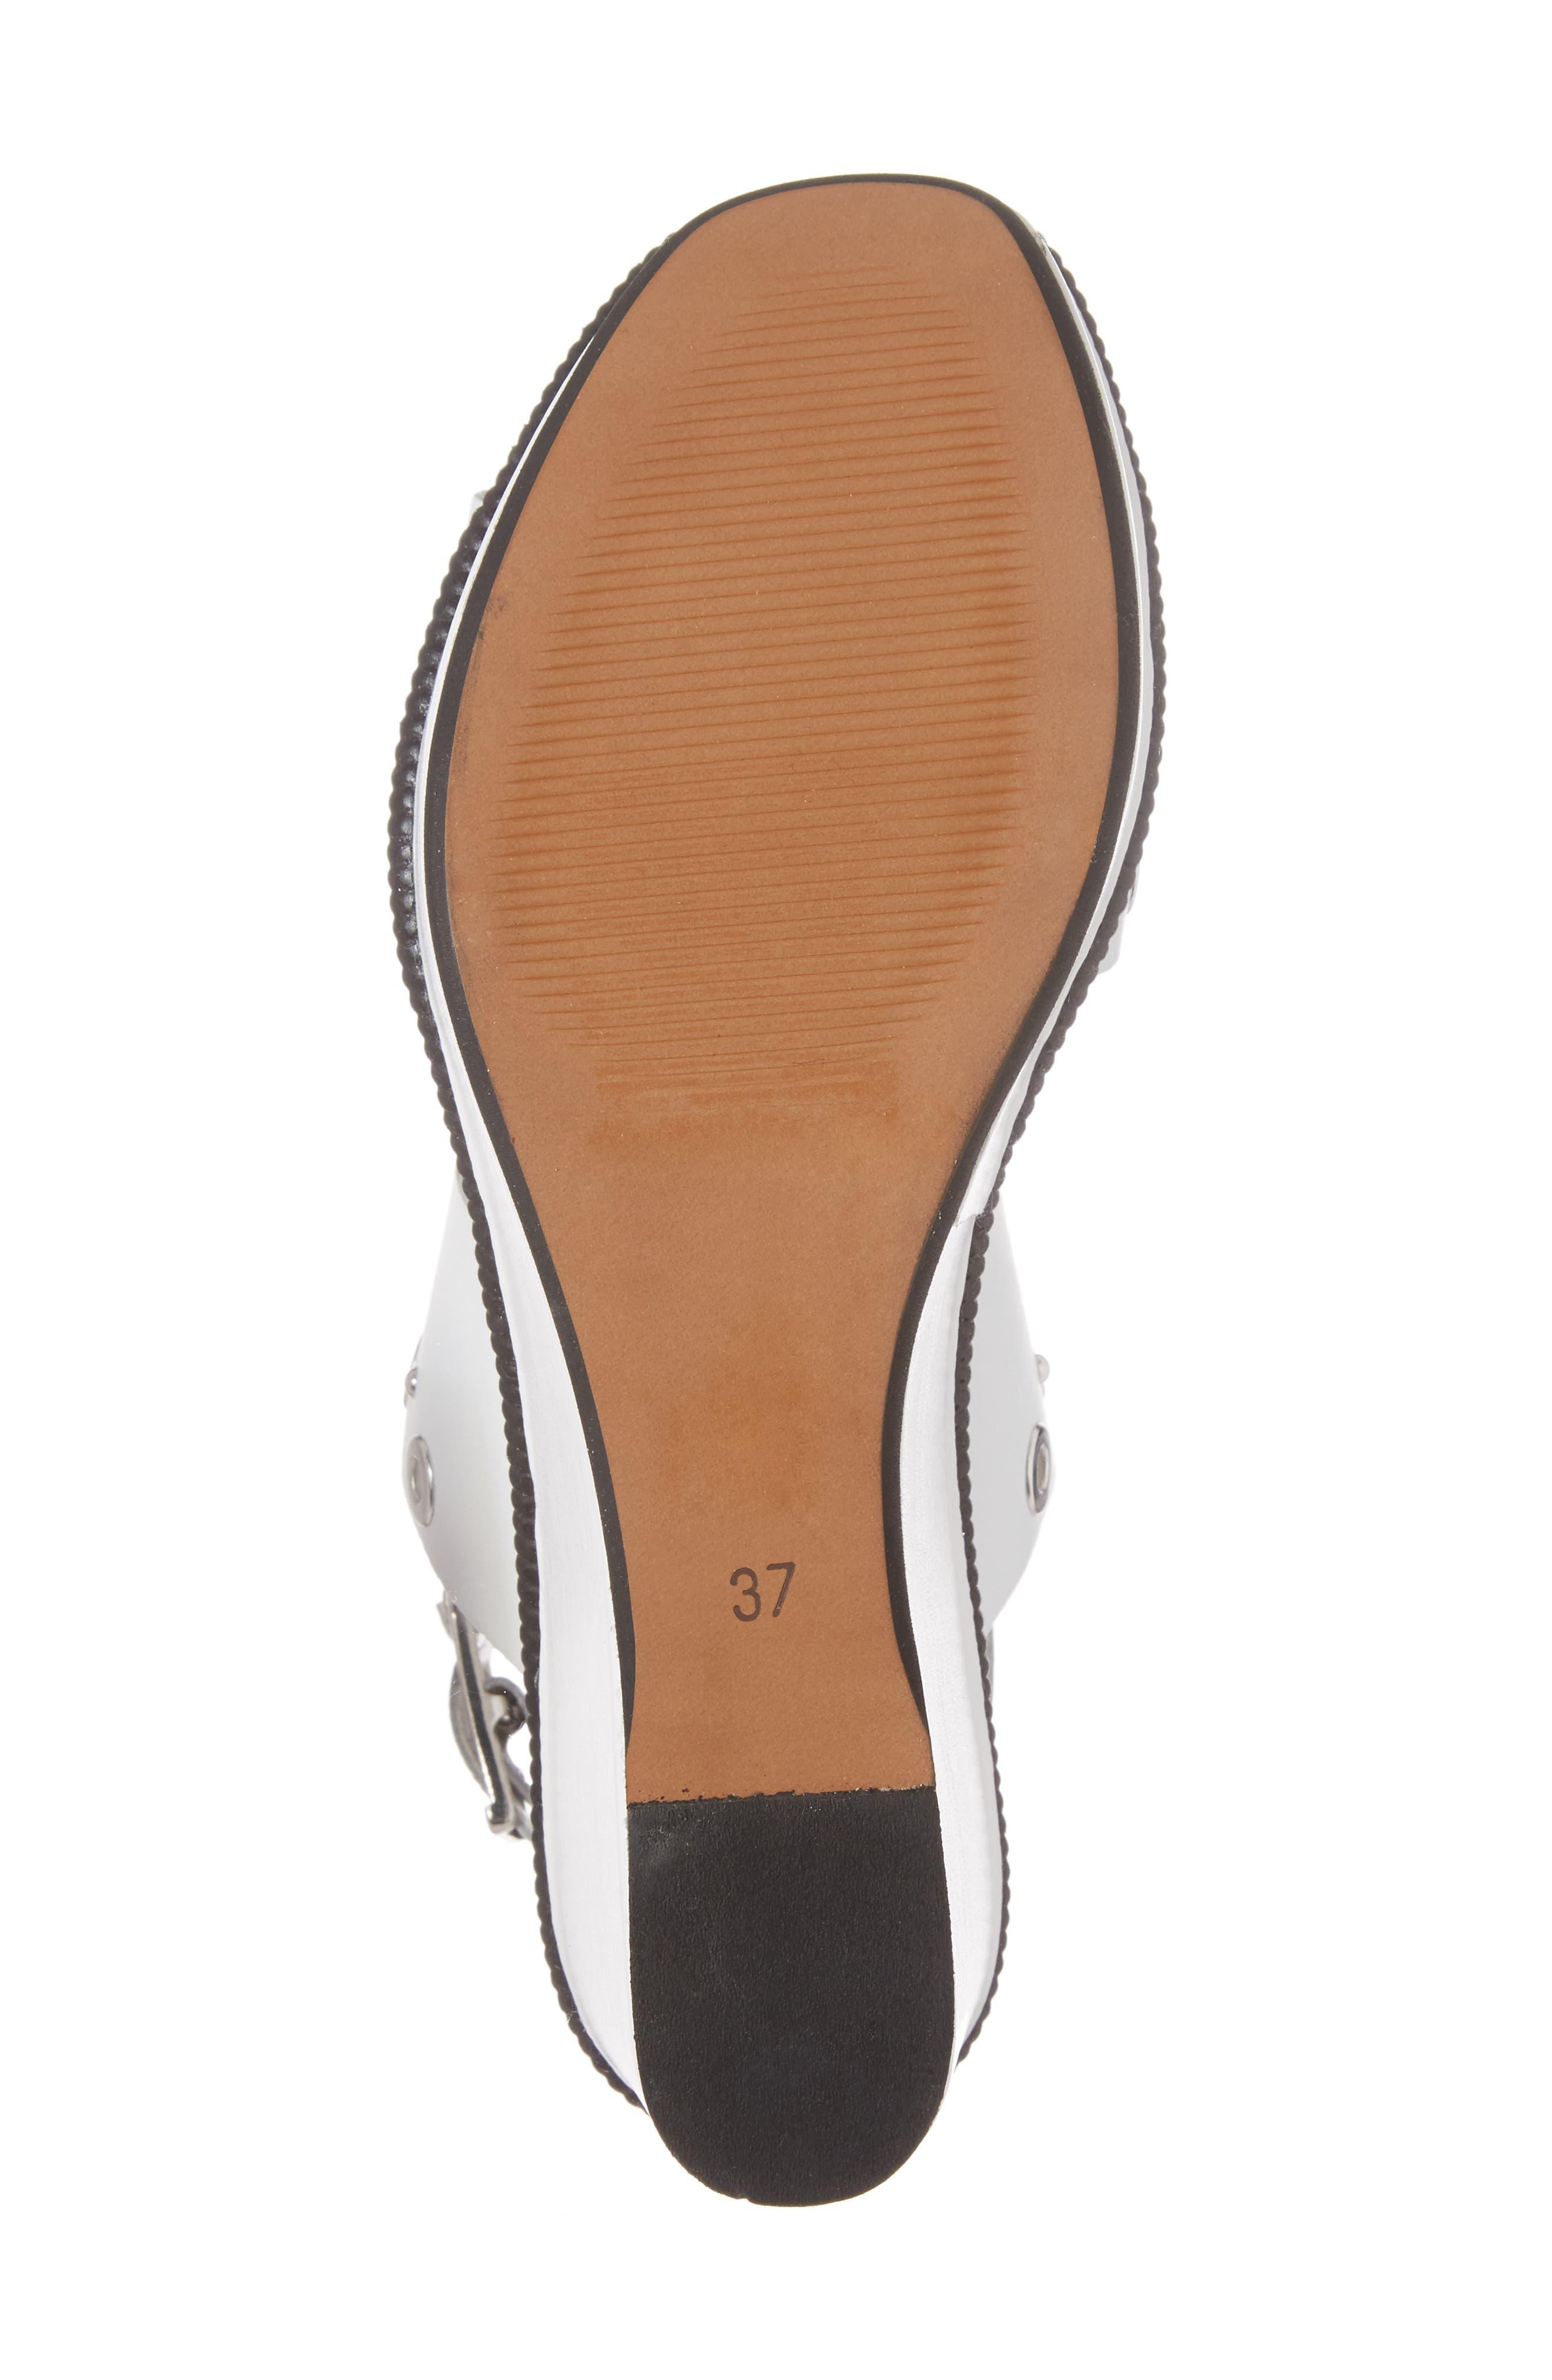 Wizz Grommeted Platform Wedge Sandal,                             Alternate thumbnail 12, color,